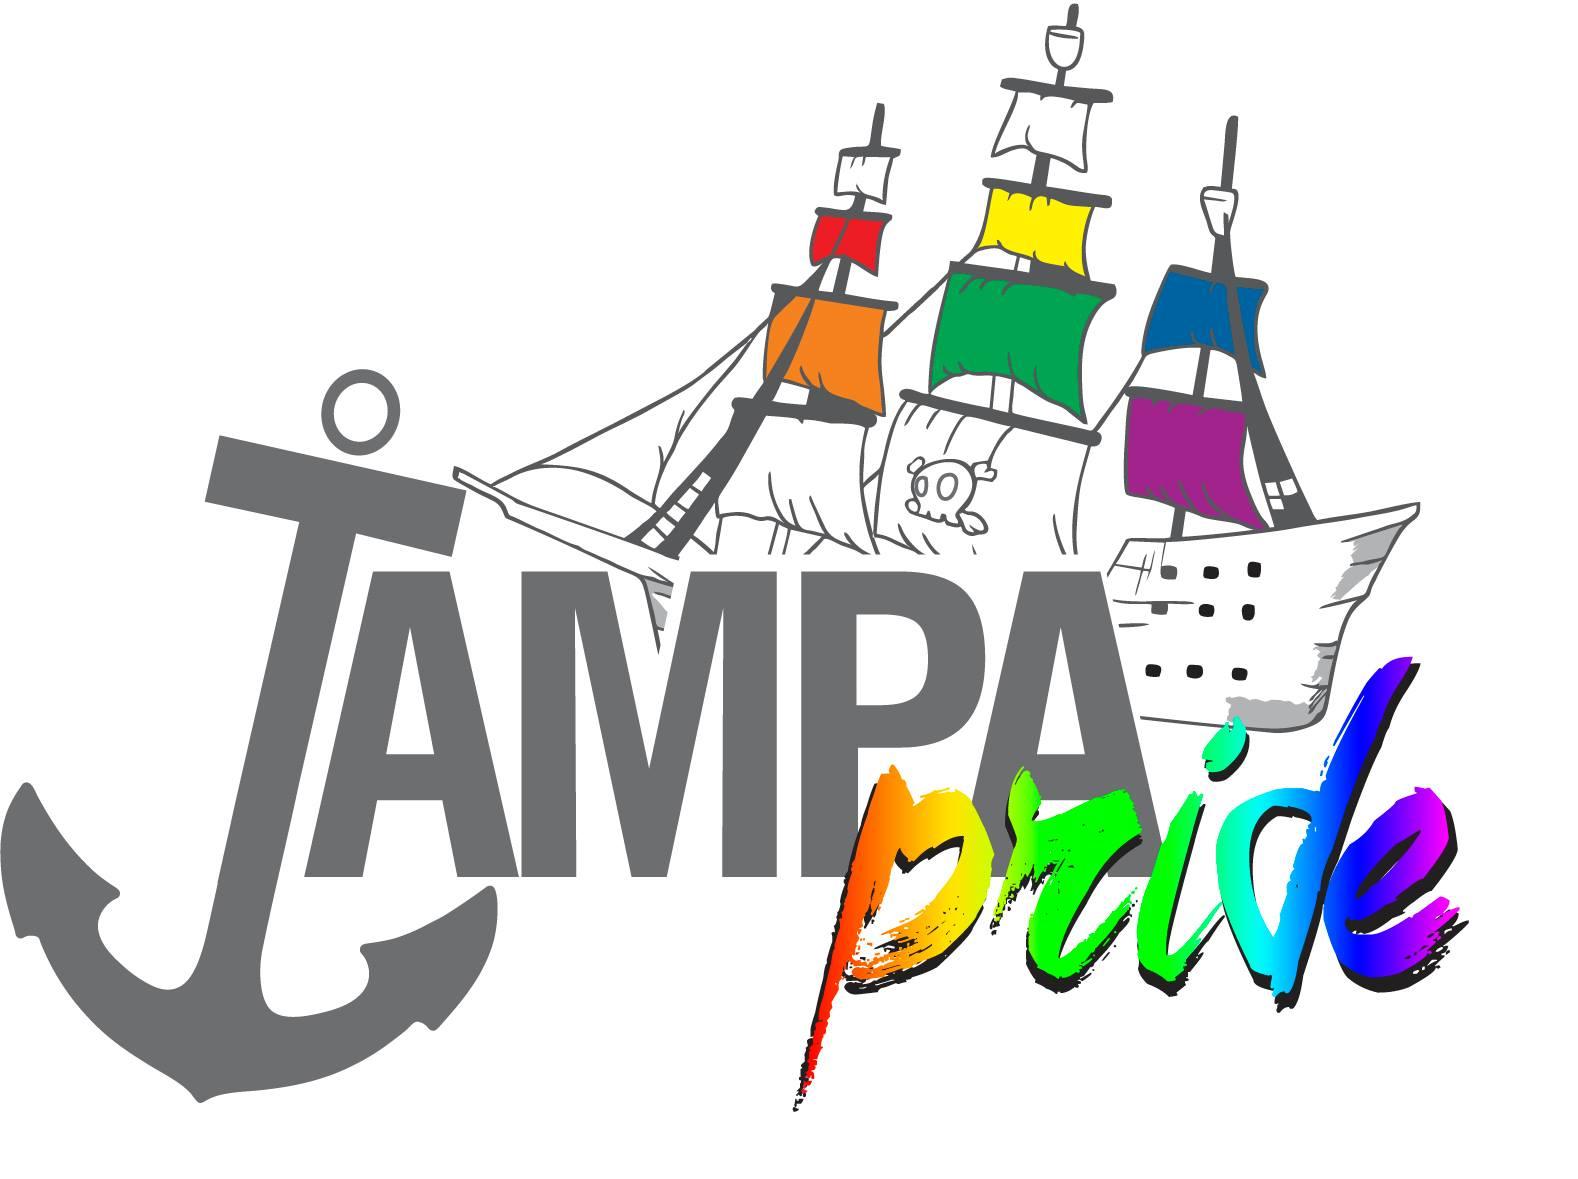 Tampa Diversity Parade in Ybor City